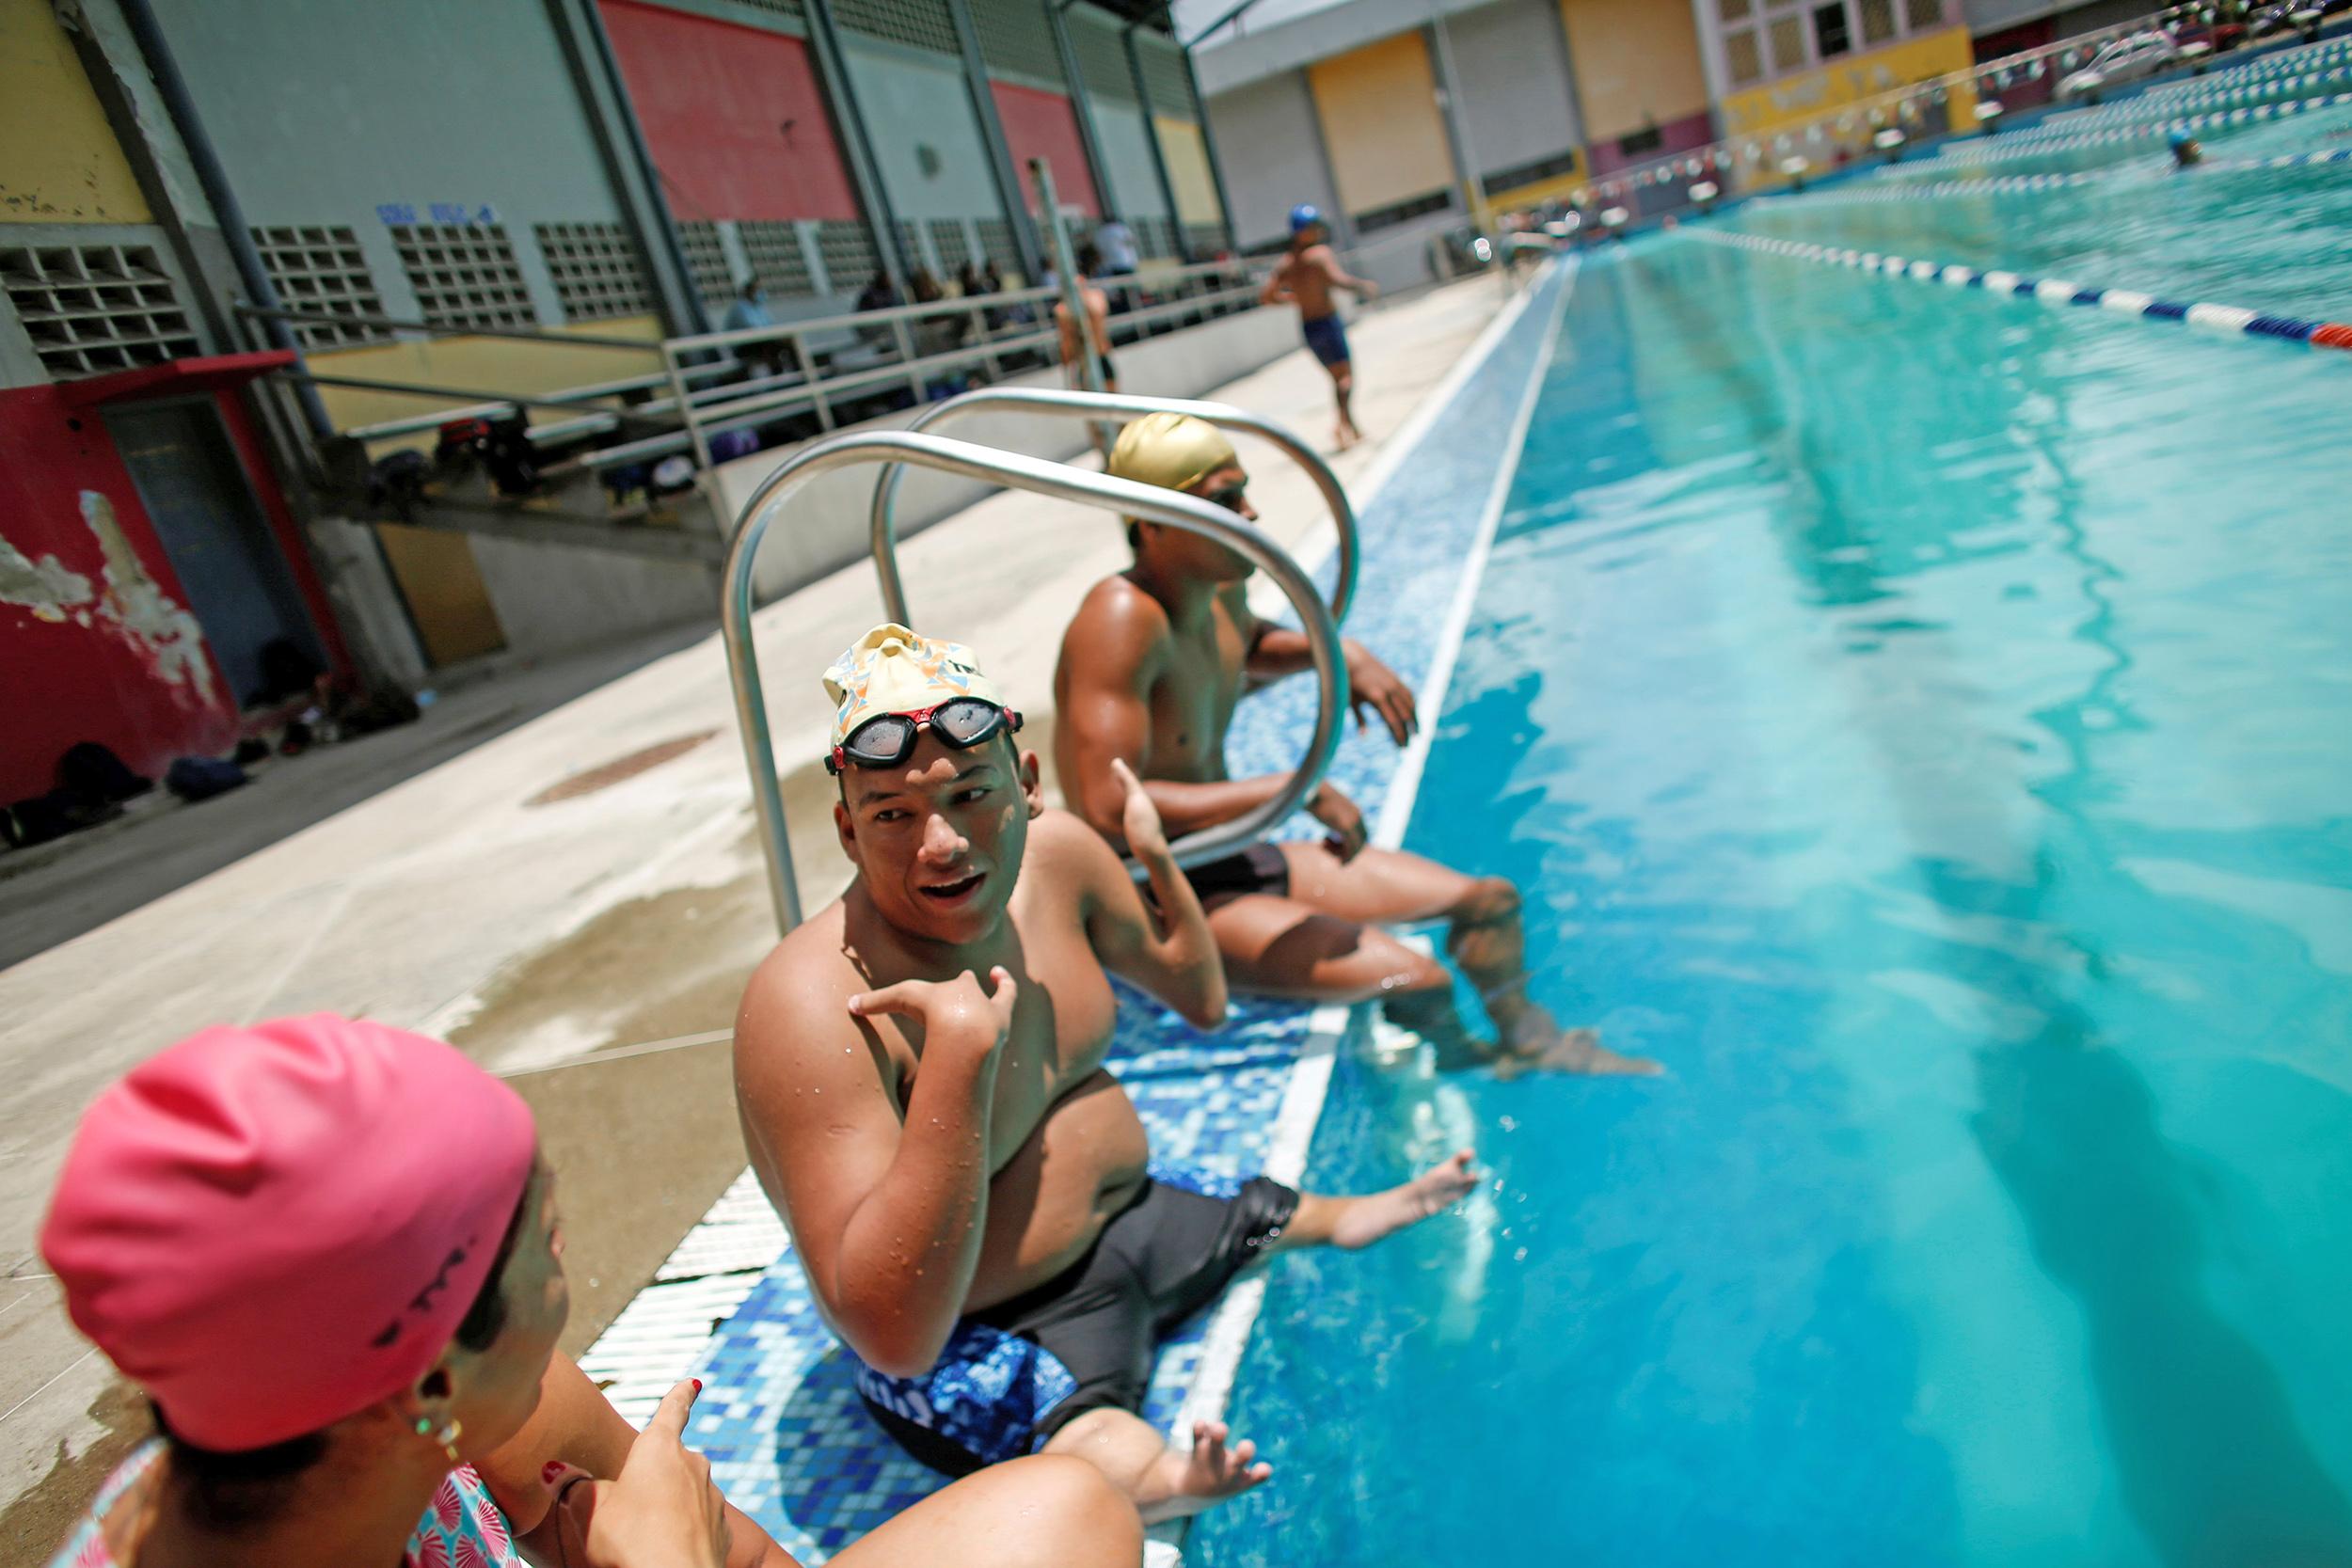 Venezuelan Paralympic athletes dream of winning medals in Tokyo